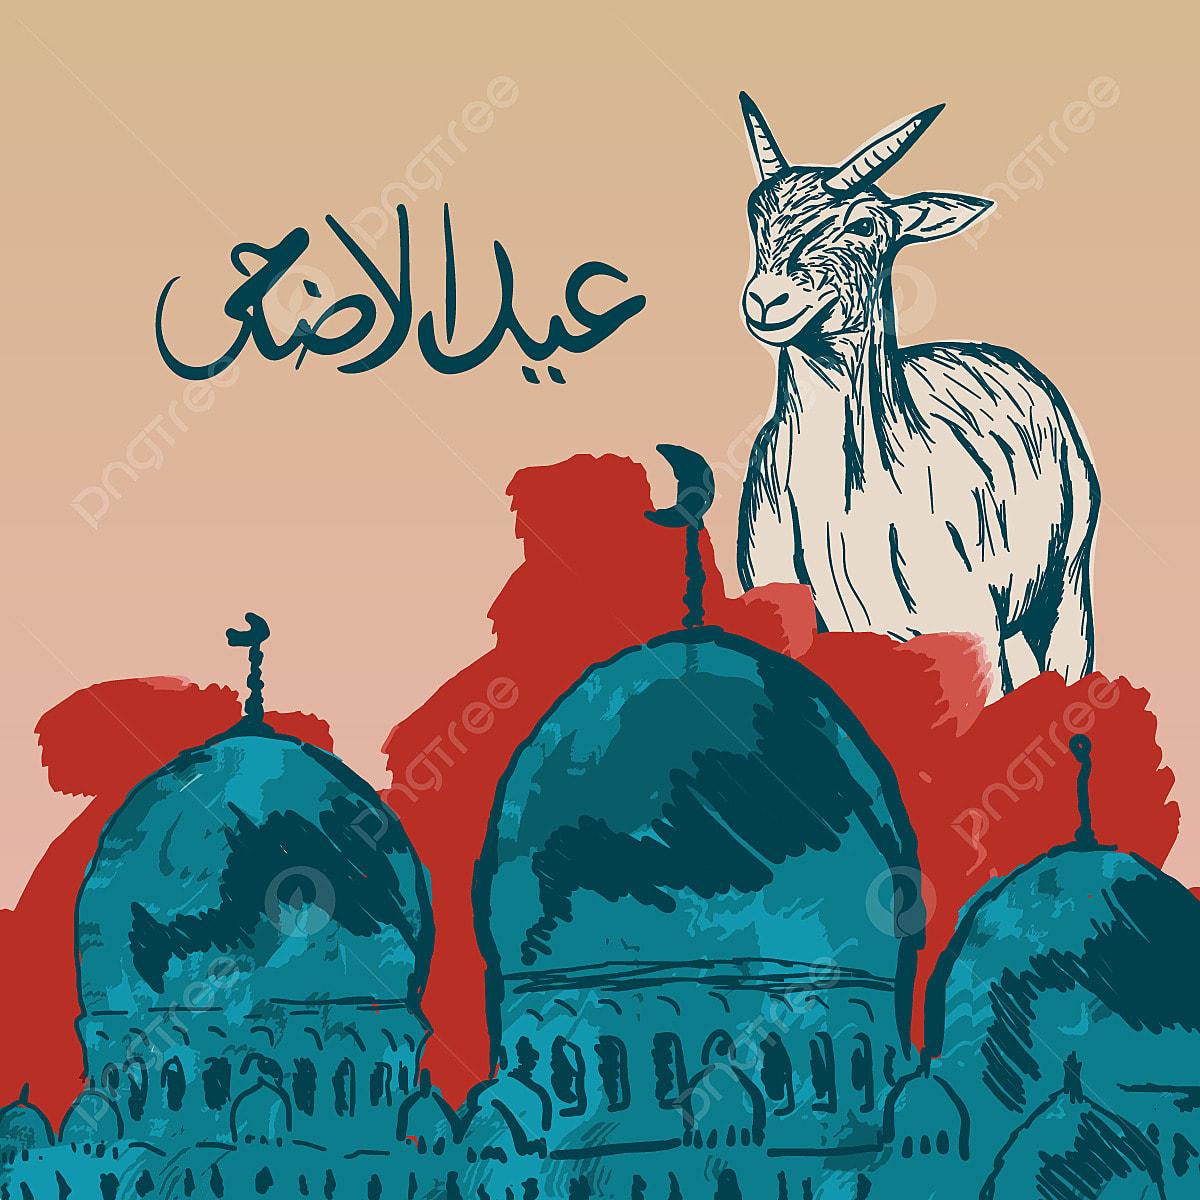 Kaligrafi Arab Teks Idul Rabi Mubarak Dengan Tangan Ditarik Masjid